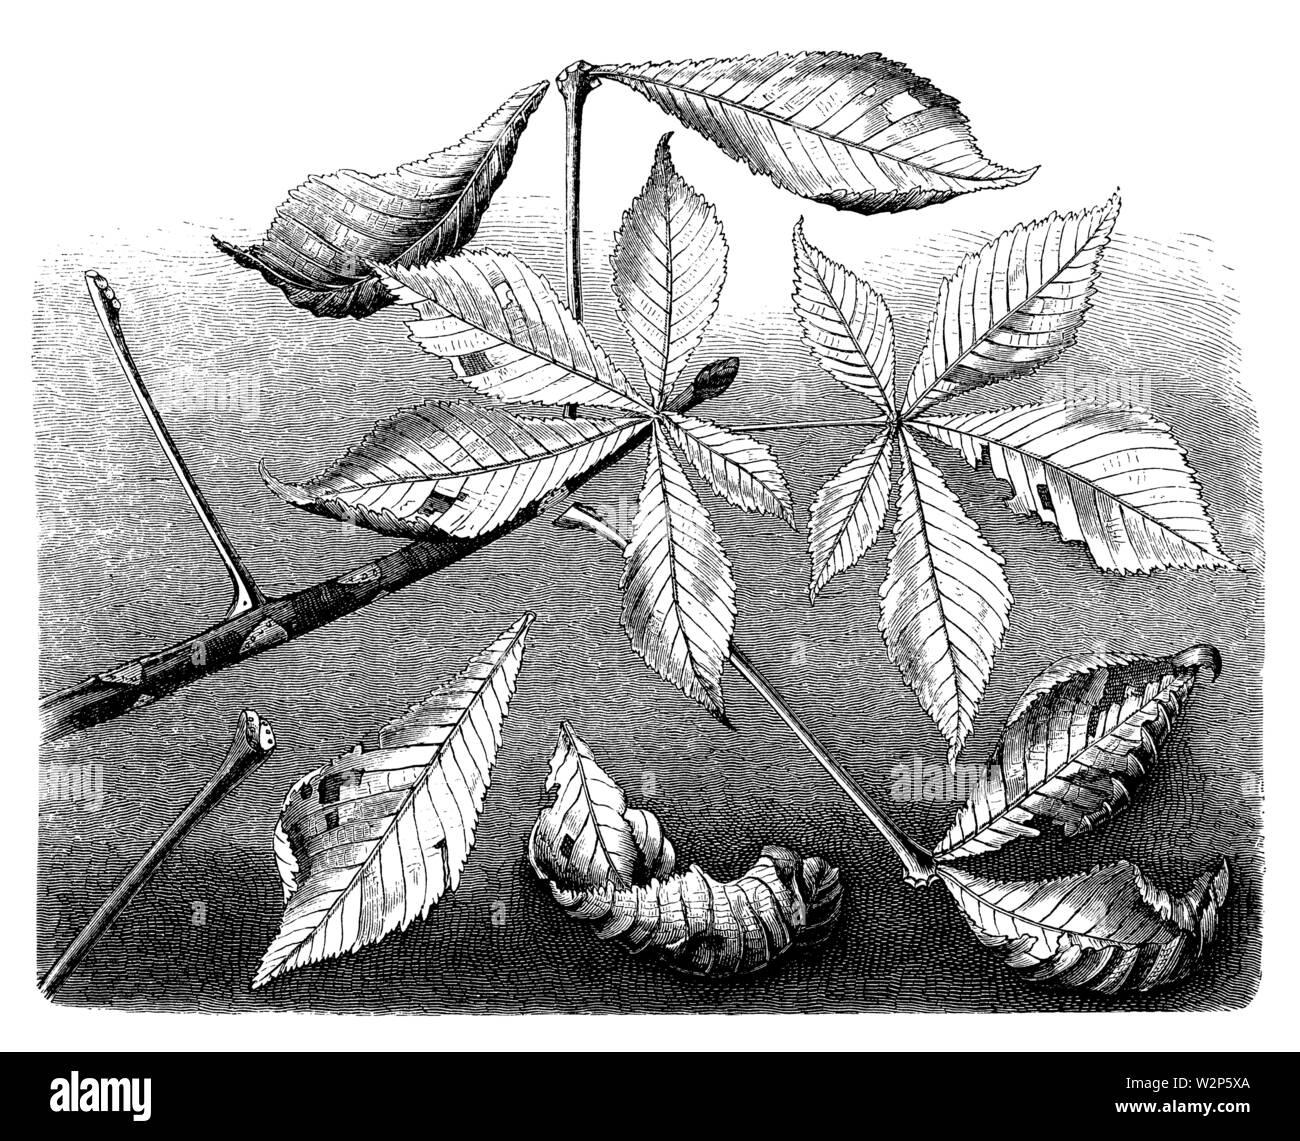 horse-chestnut, conker tree (Aesculus hippocastanum), Aesculus hippocastanum,  (botany book, 1888) - Stock Image